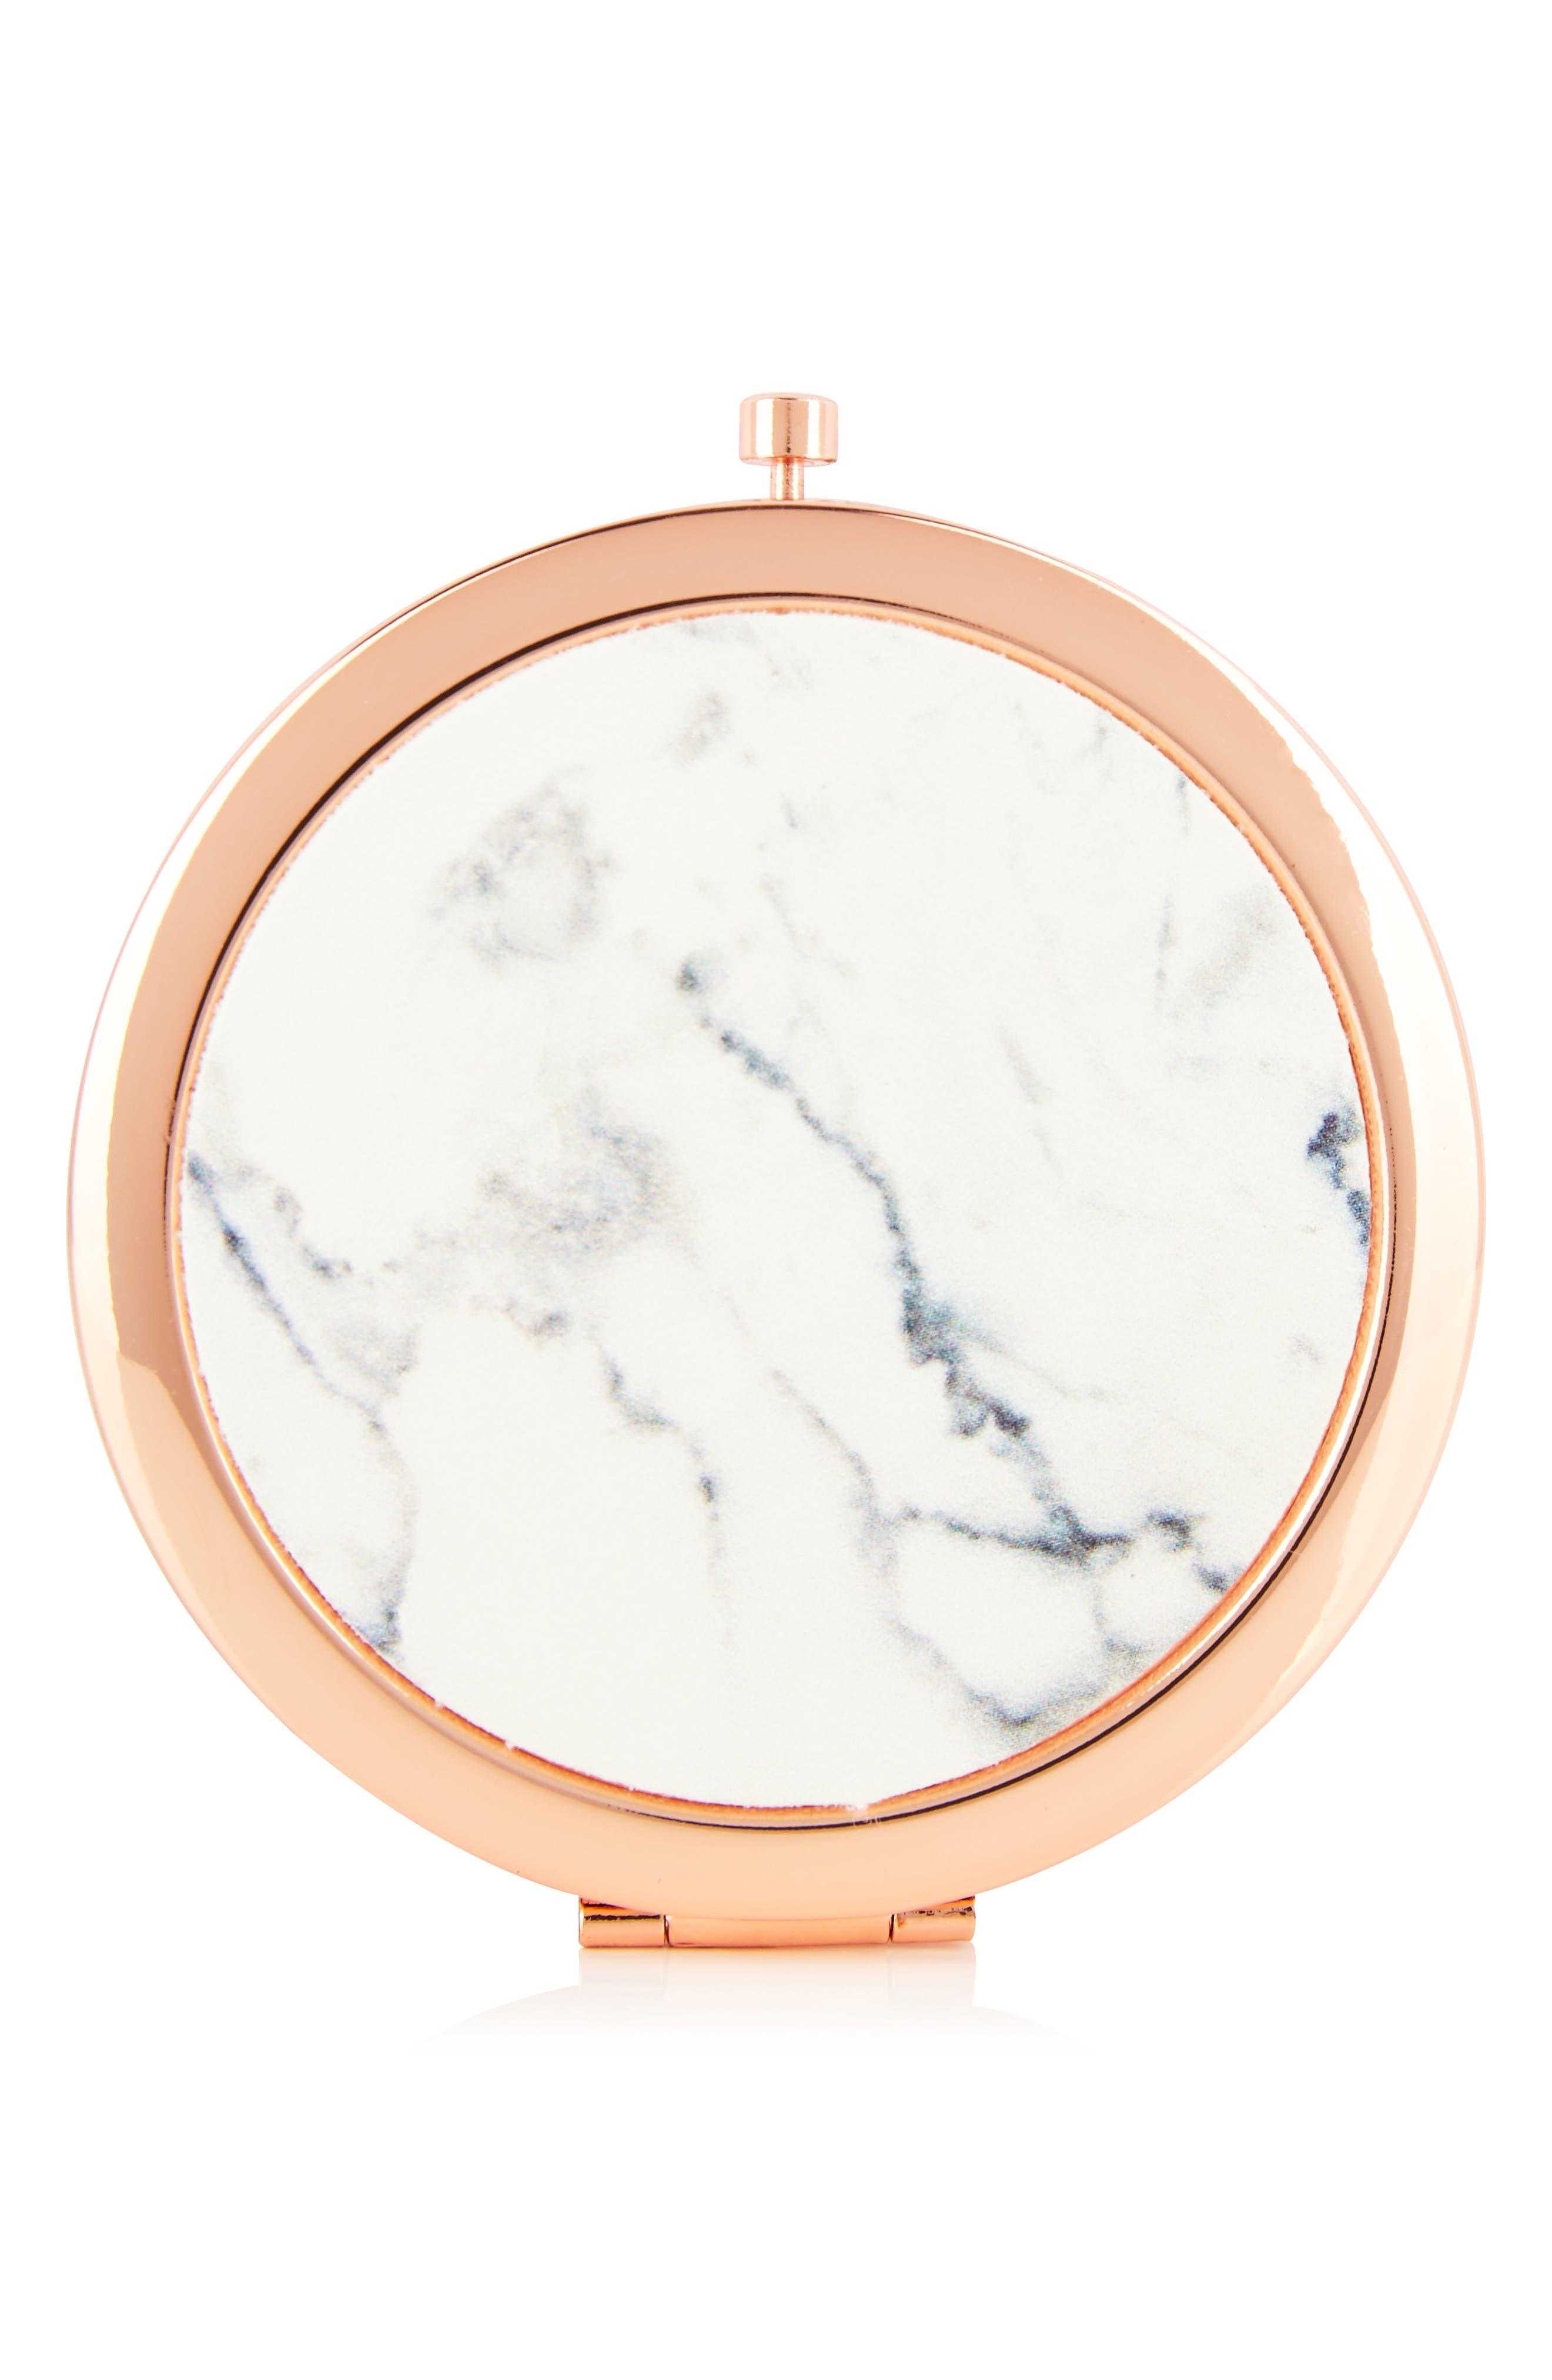 SKINNYDIP,                             Skinny Dip Marble Compact Mirror,                             Alternate thumbnail 2, color,                             000